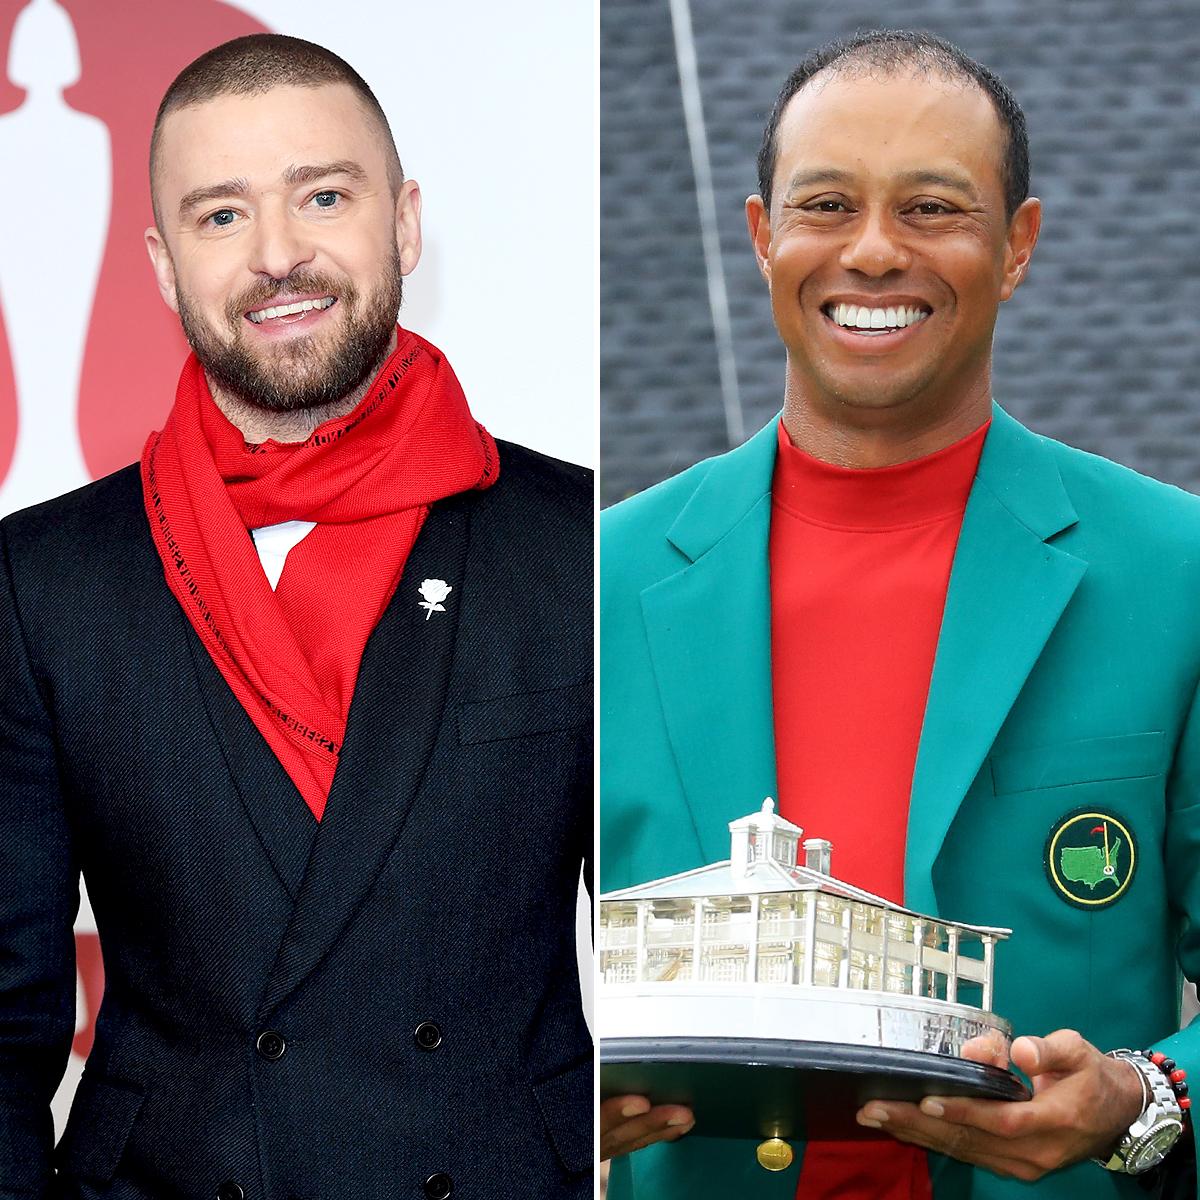 Justin Timberlake Tiger Wood Bonded Over Kids - Justin Timberlake and Tiger Woods